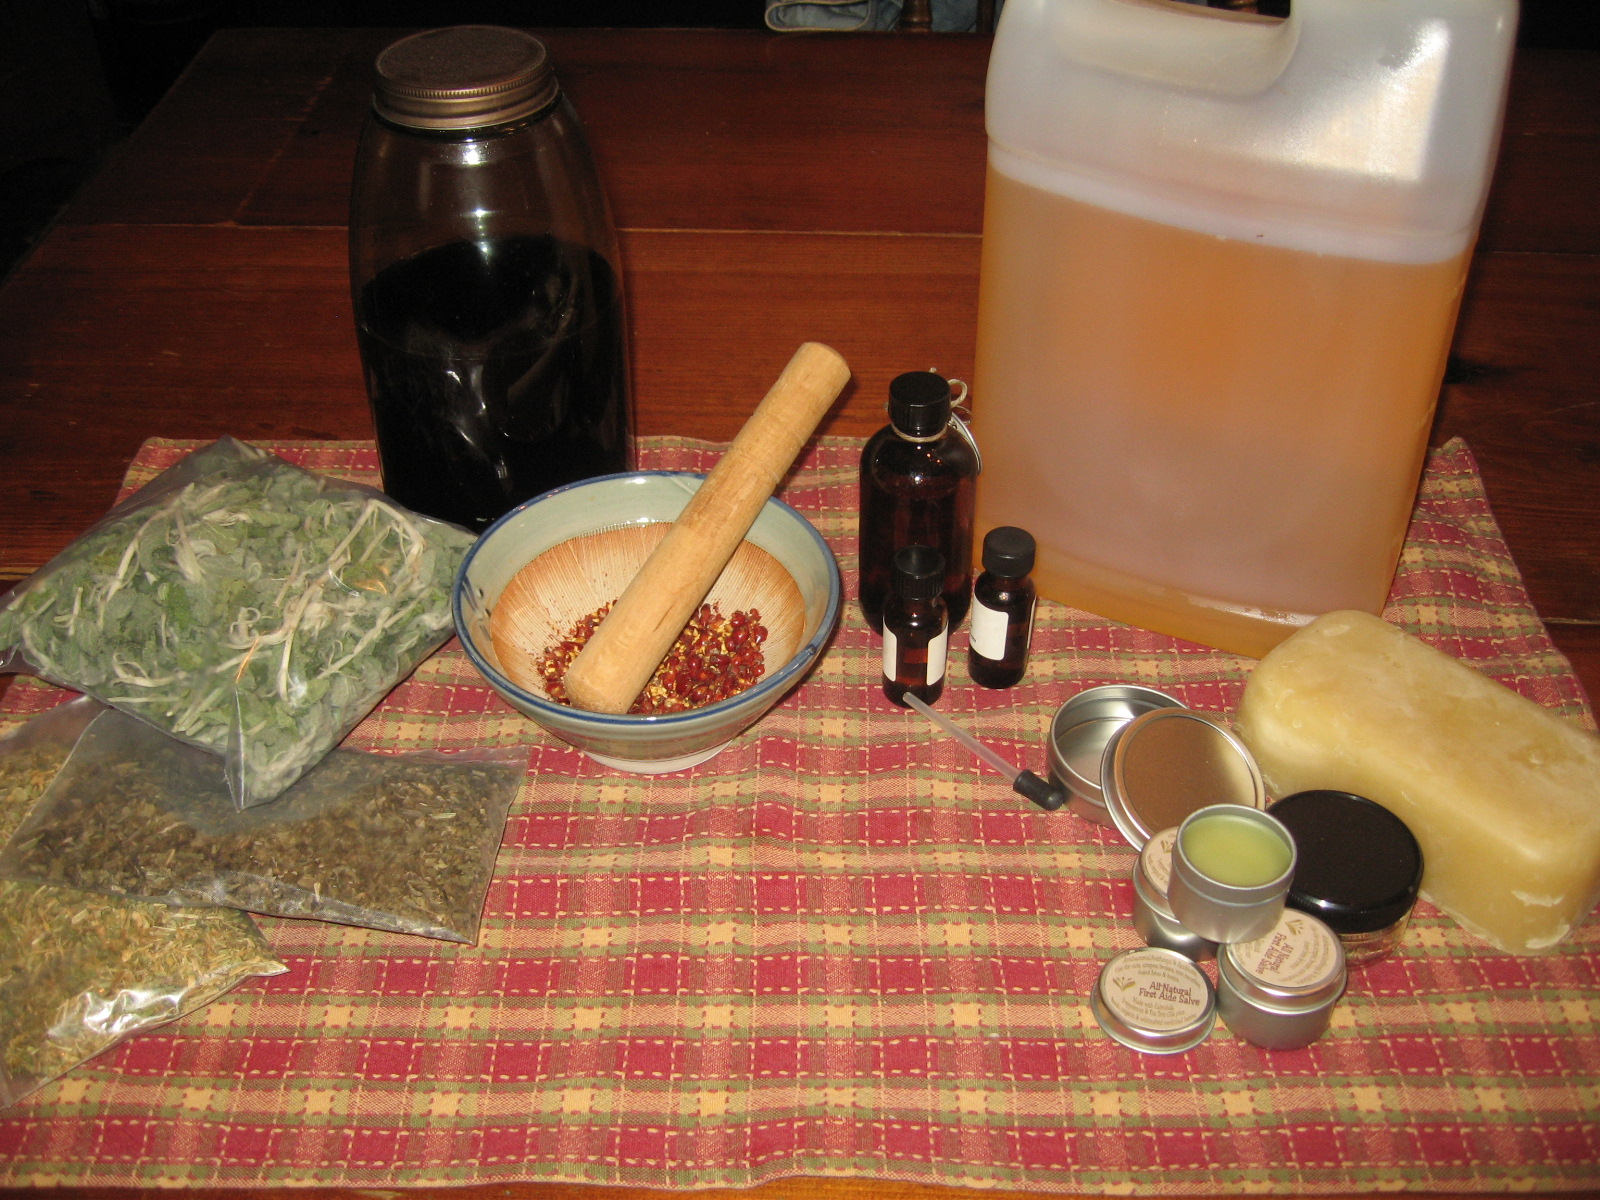 https://i2.wp.com/4.bp.blogspot.com/_OLCPV59IHWQ/TTnK0qY4QUI/AAAAAAAAAiY/RFxzEUYIBw8/s1600/Herbal+Remedies+001.jpg